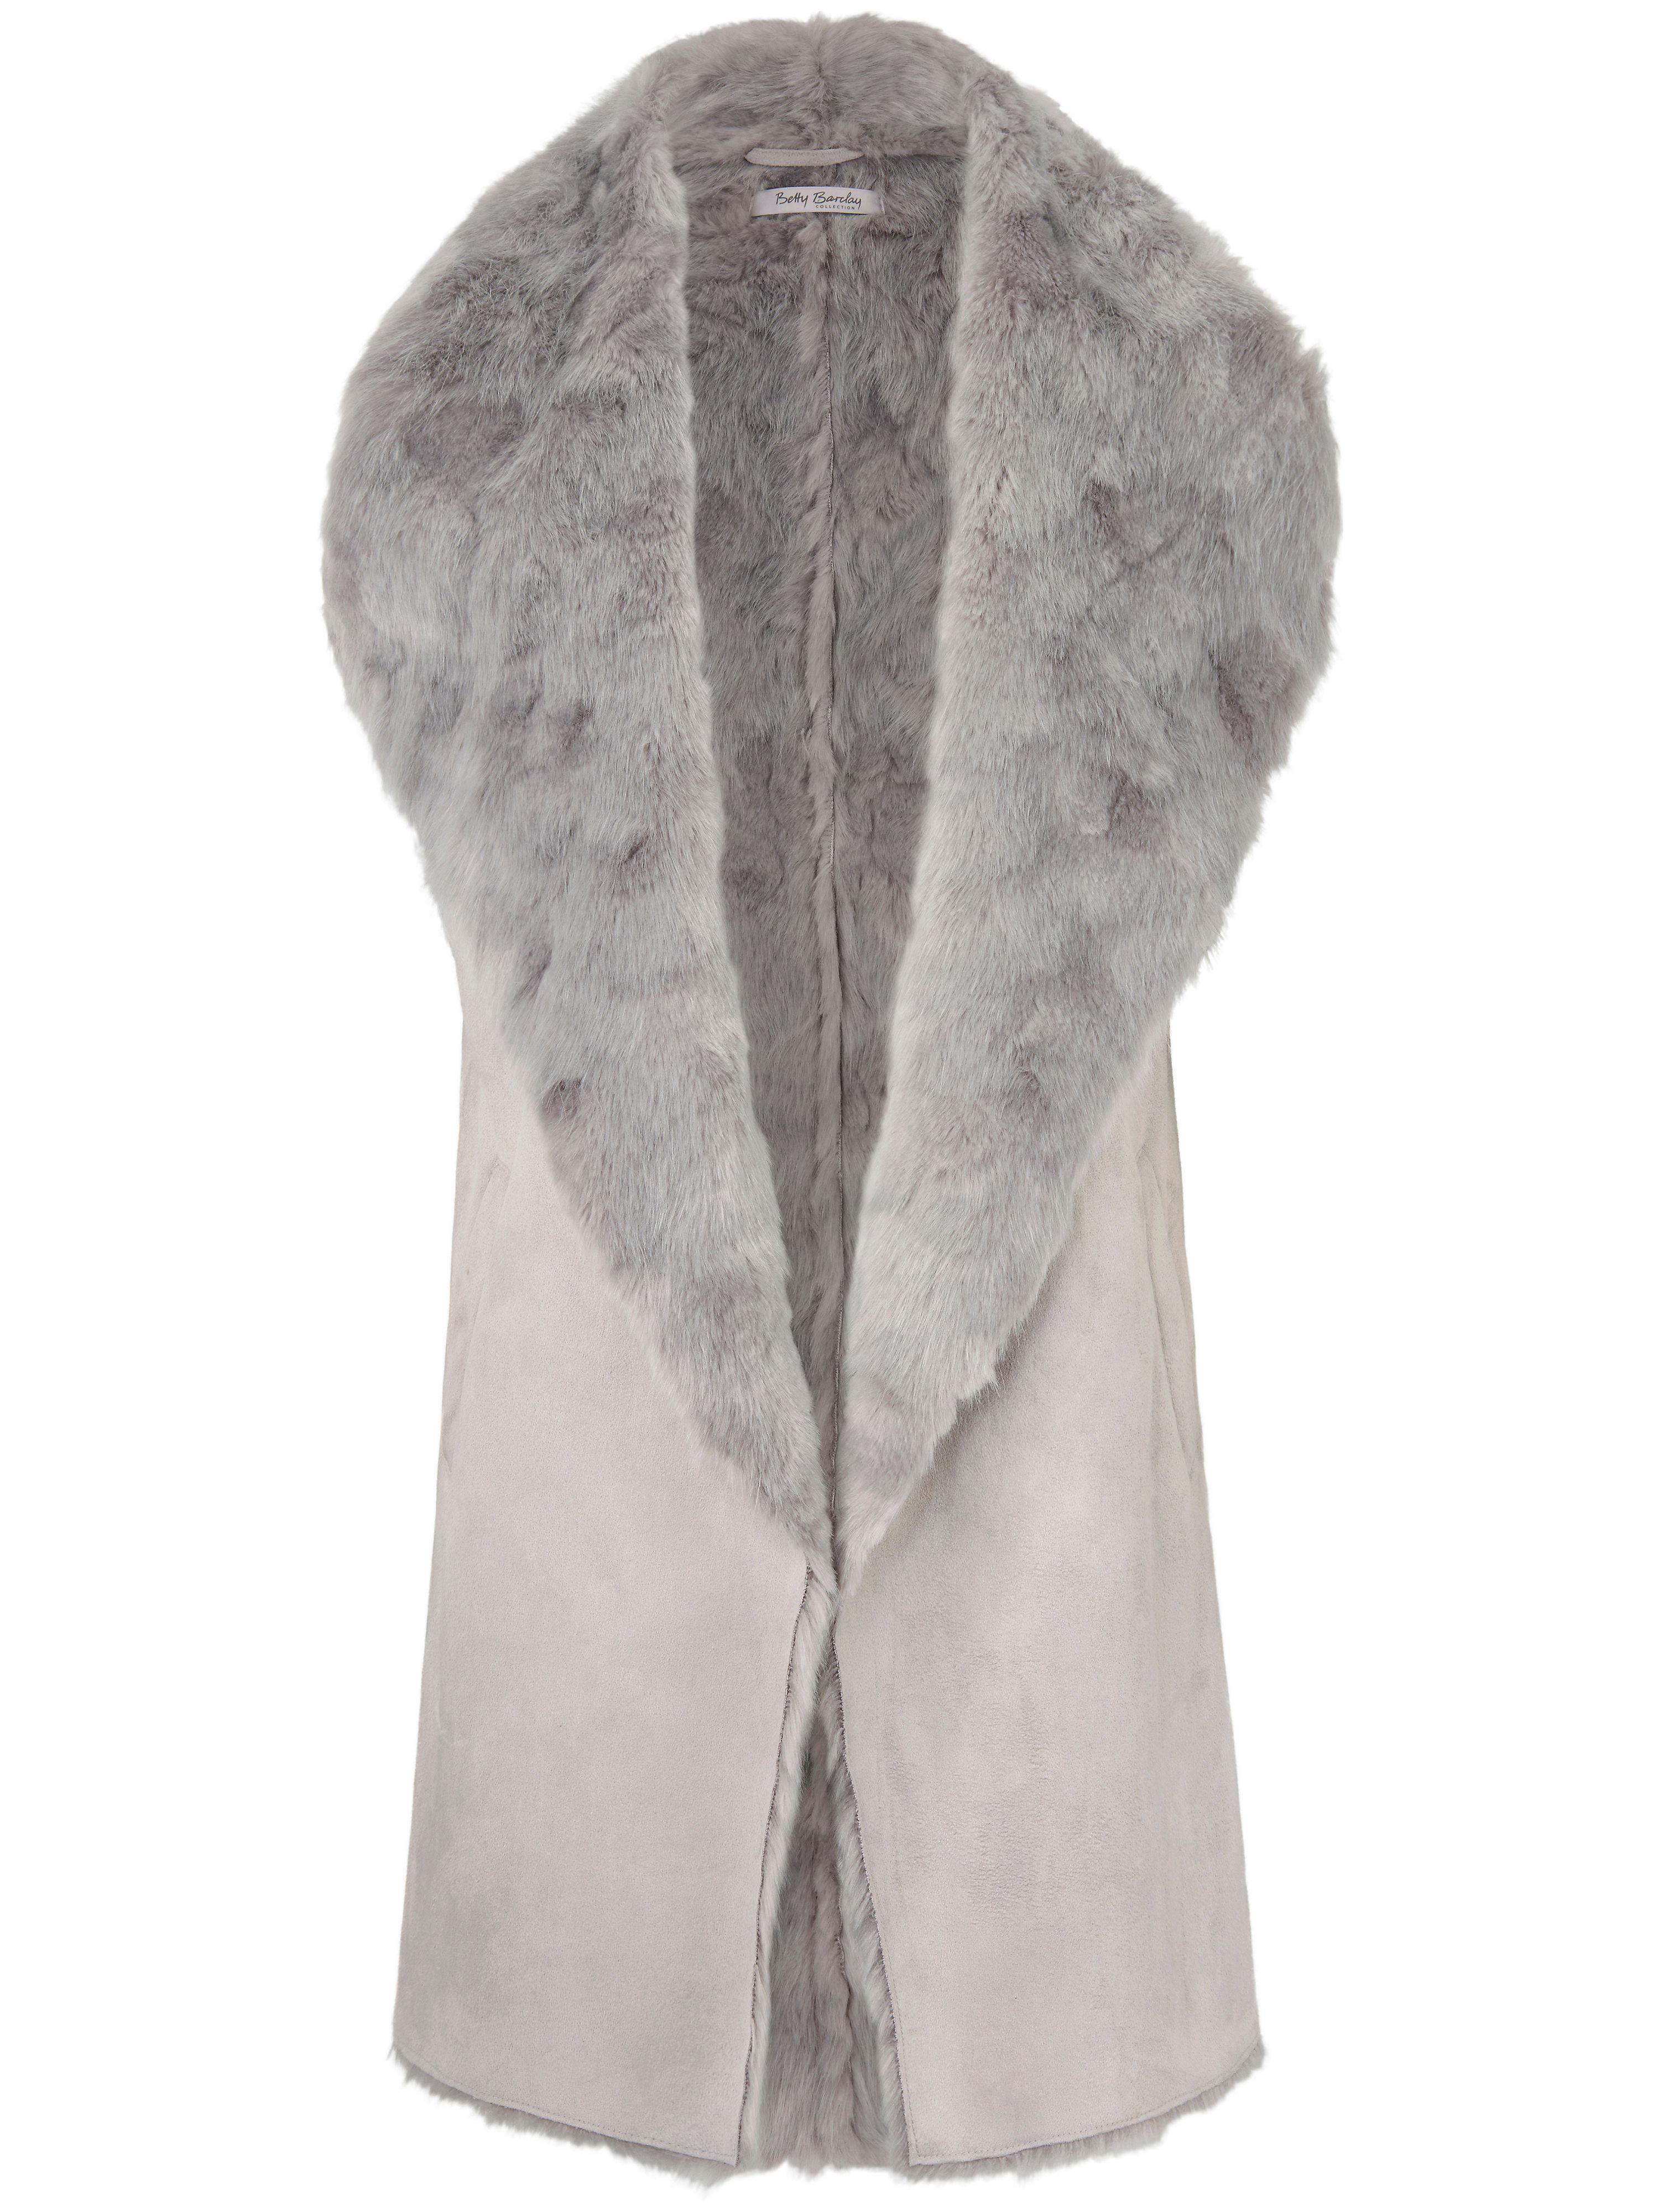 Image of   Vest Fra Betty Barclay grå